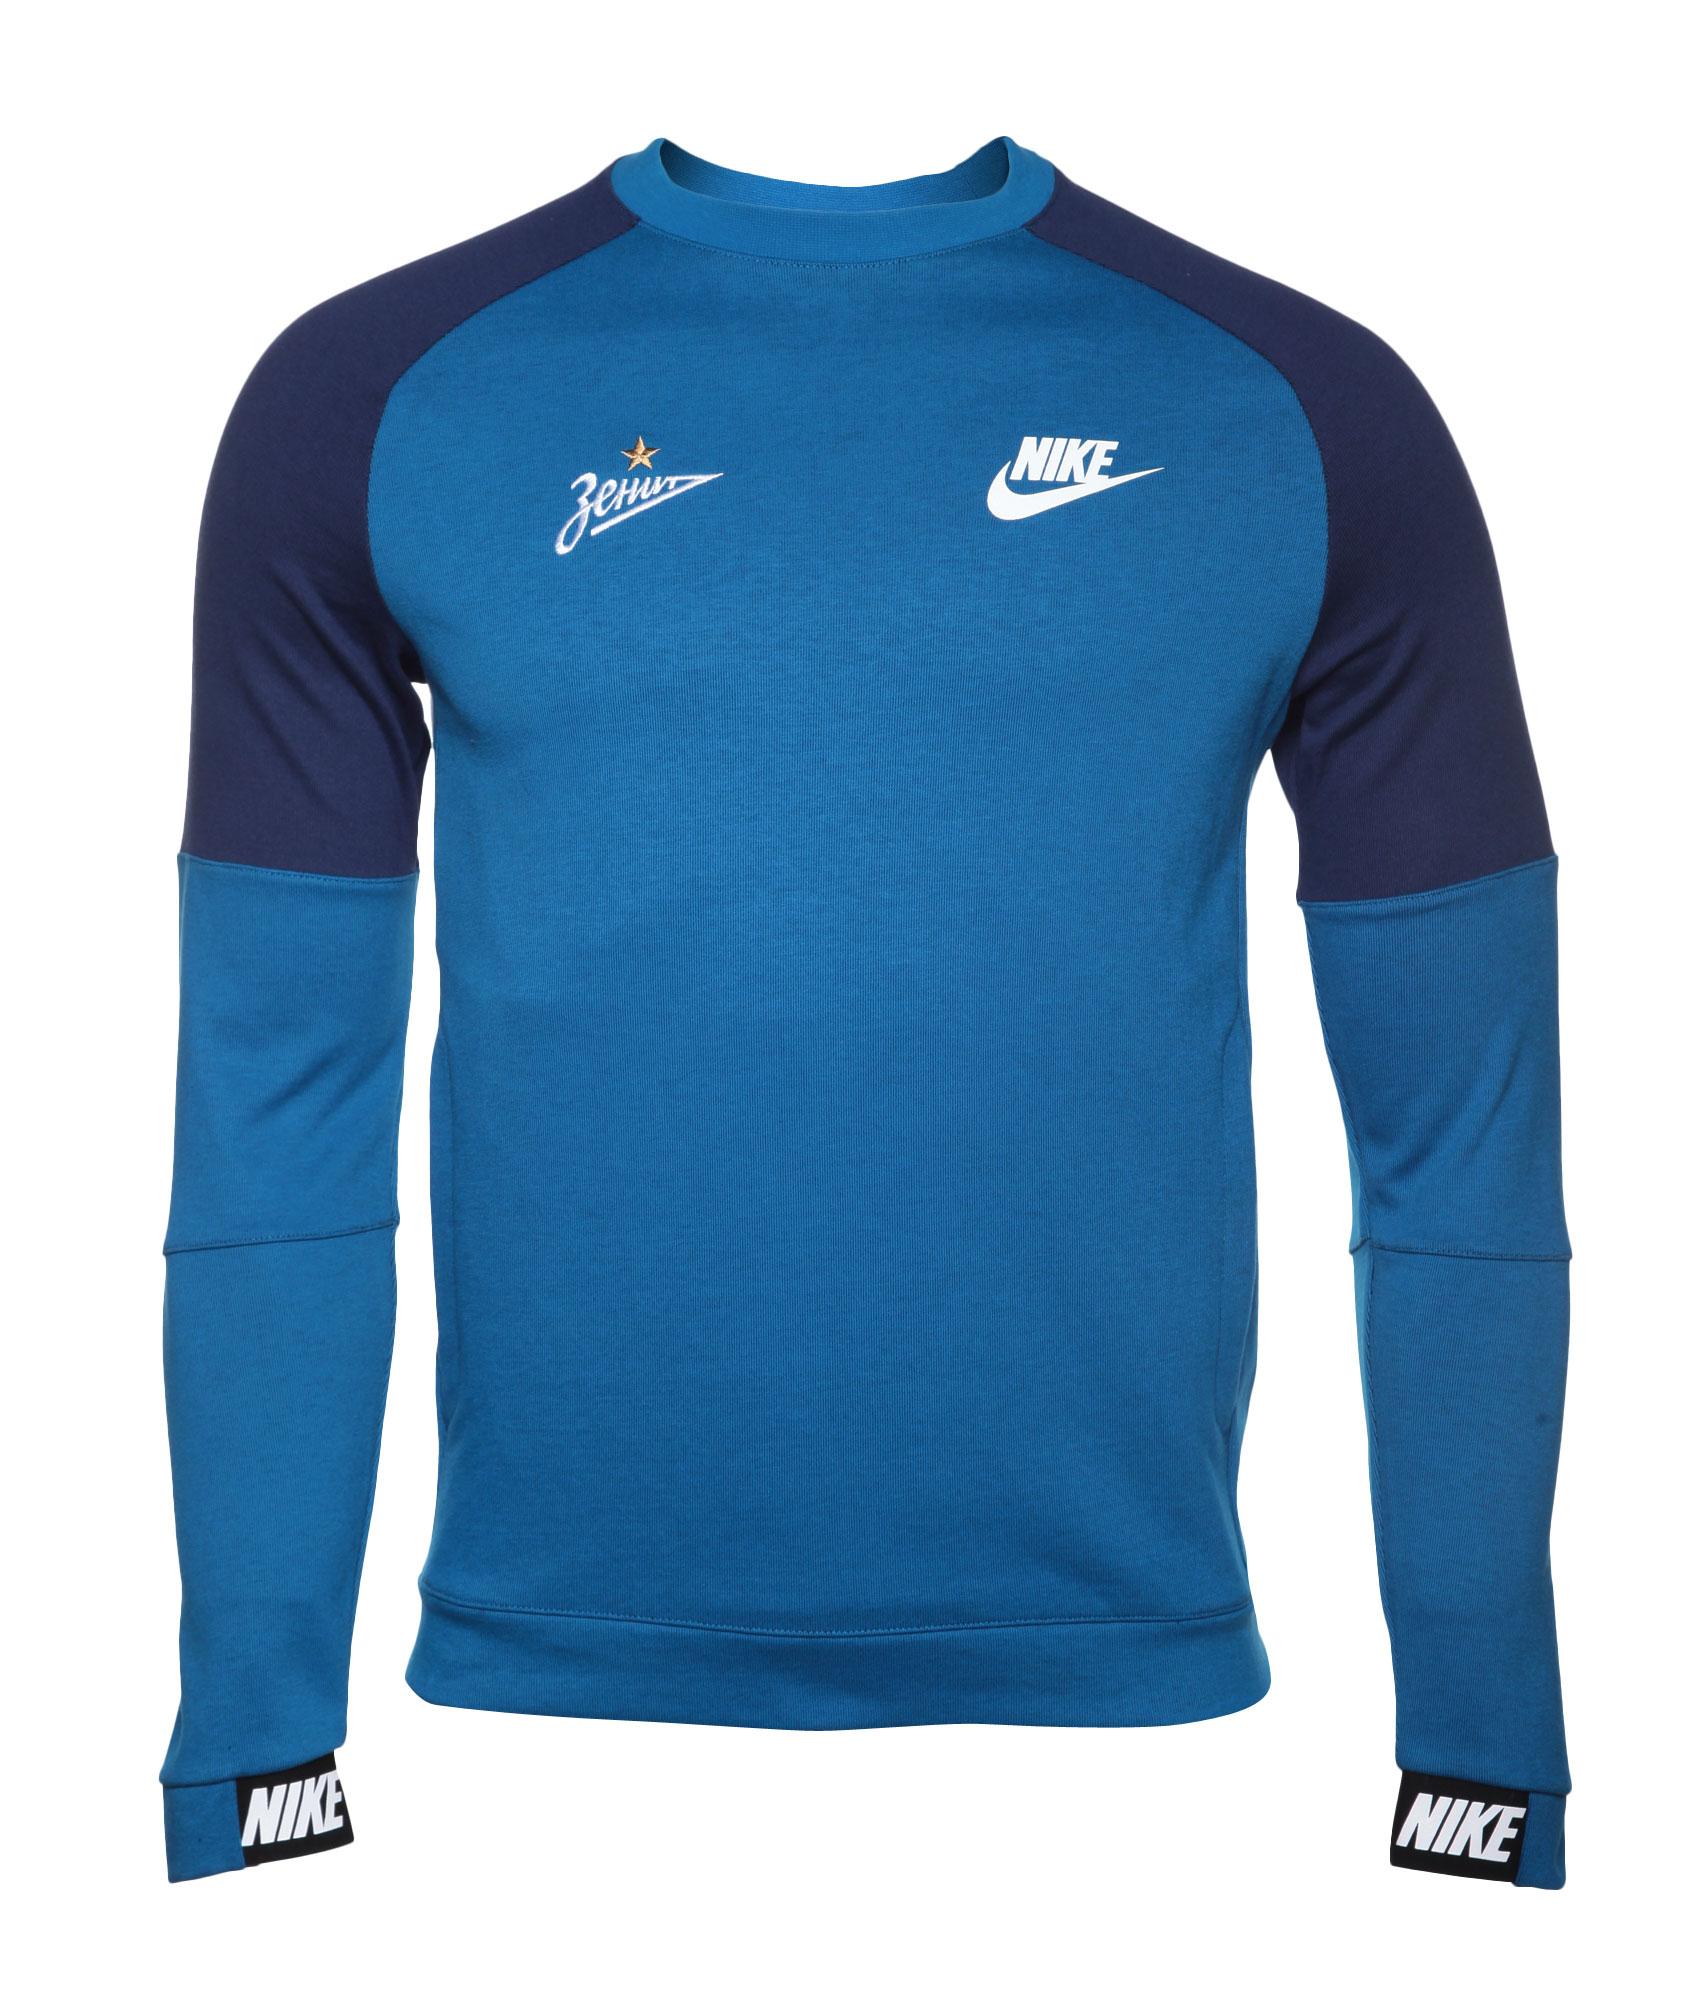 Джемпер Nike Nike Цвет-Синий джемперы nike джемпер nike element sphere 1 2 zip